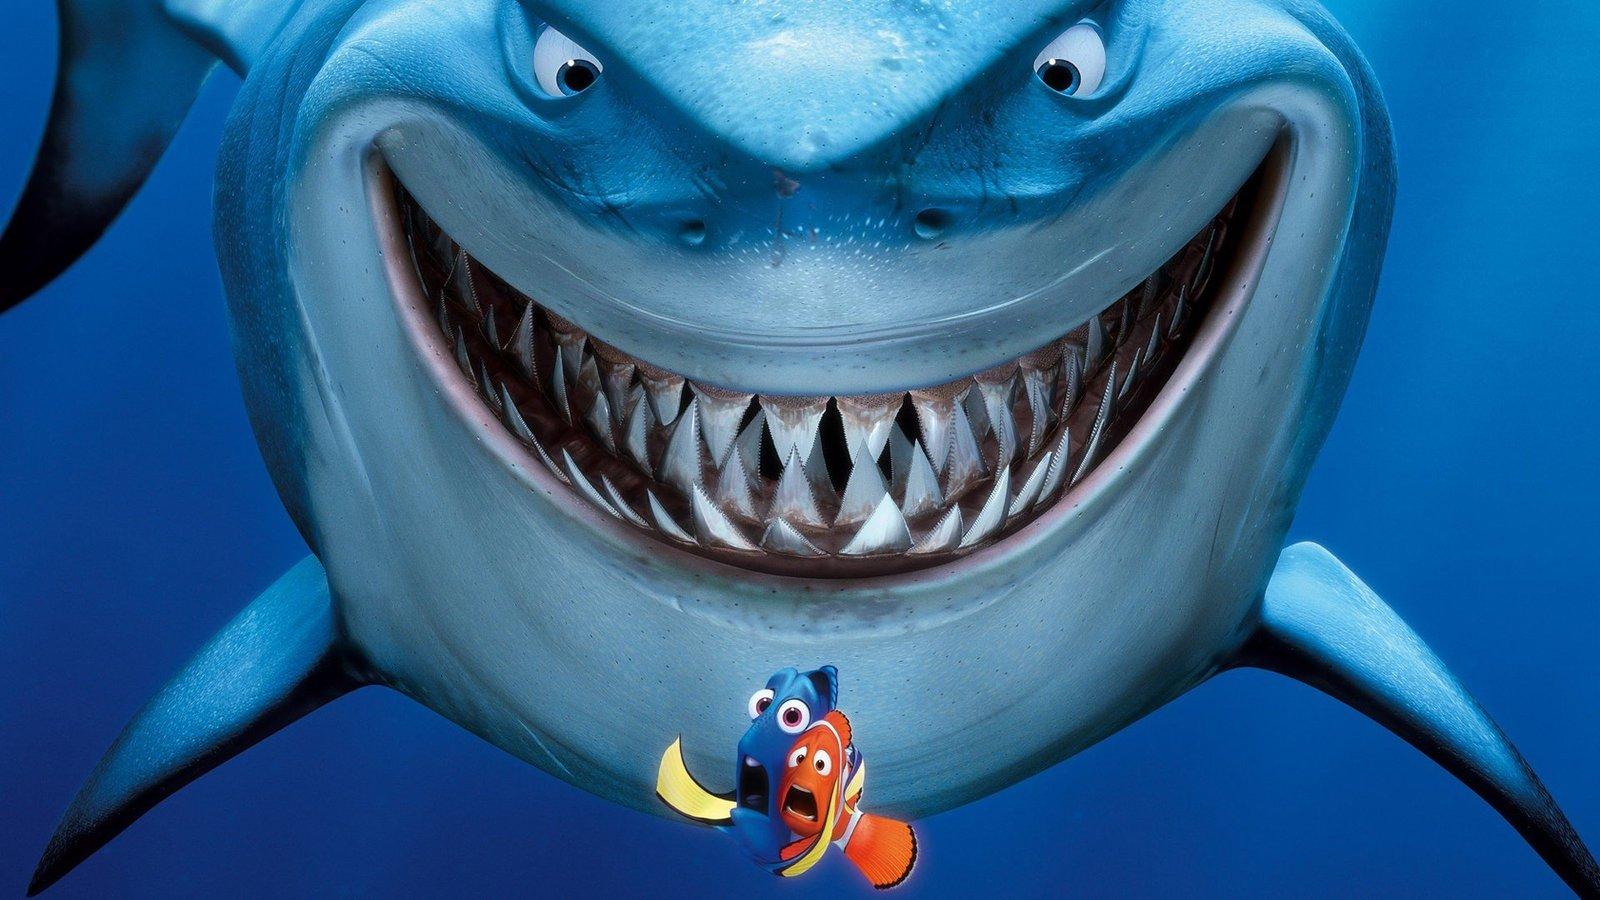 / Finding Nemo